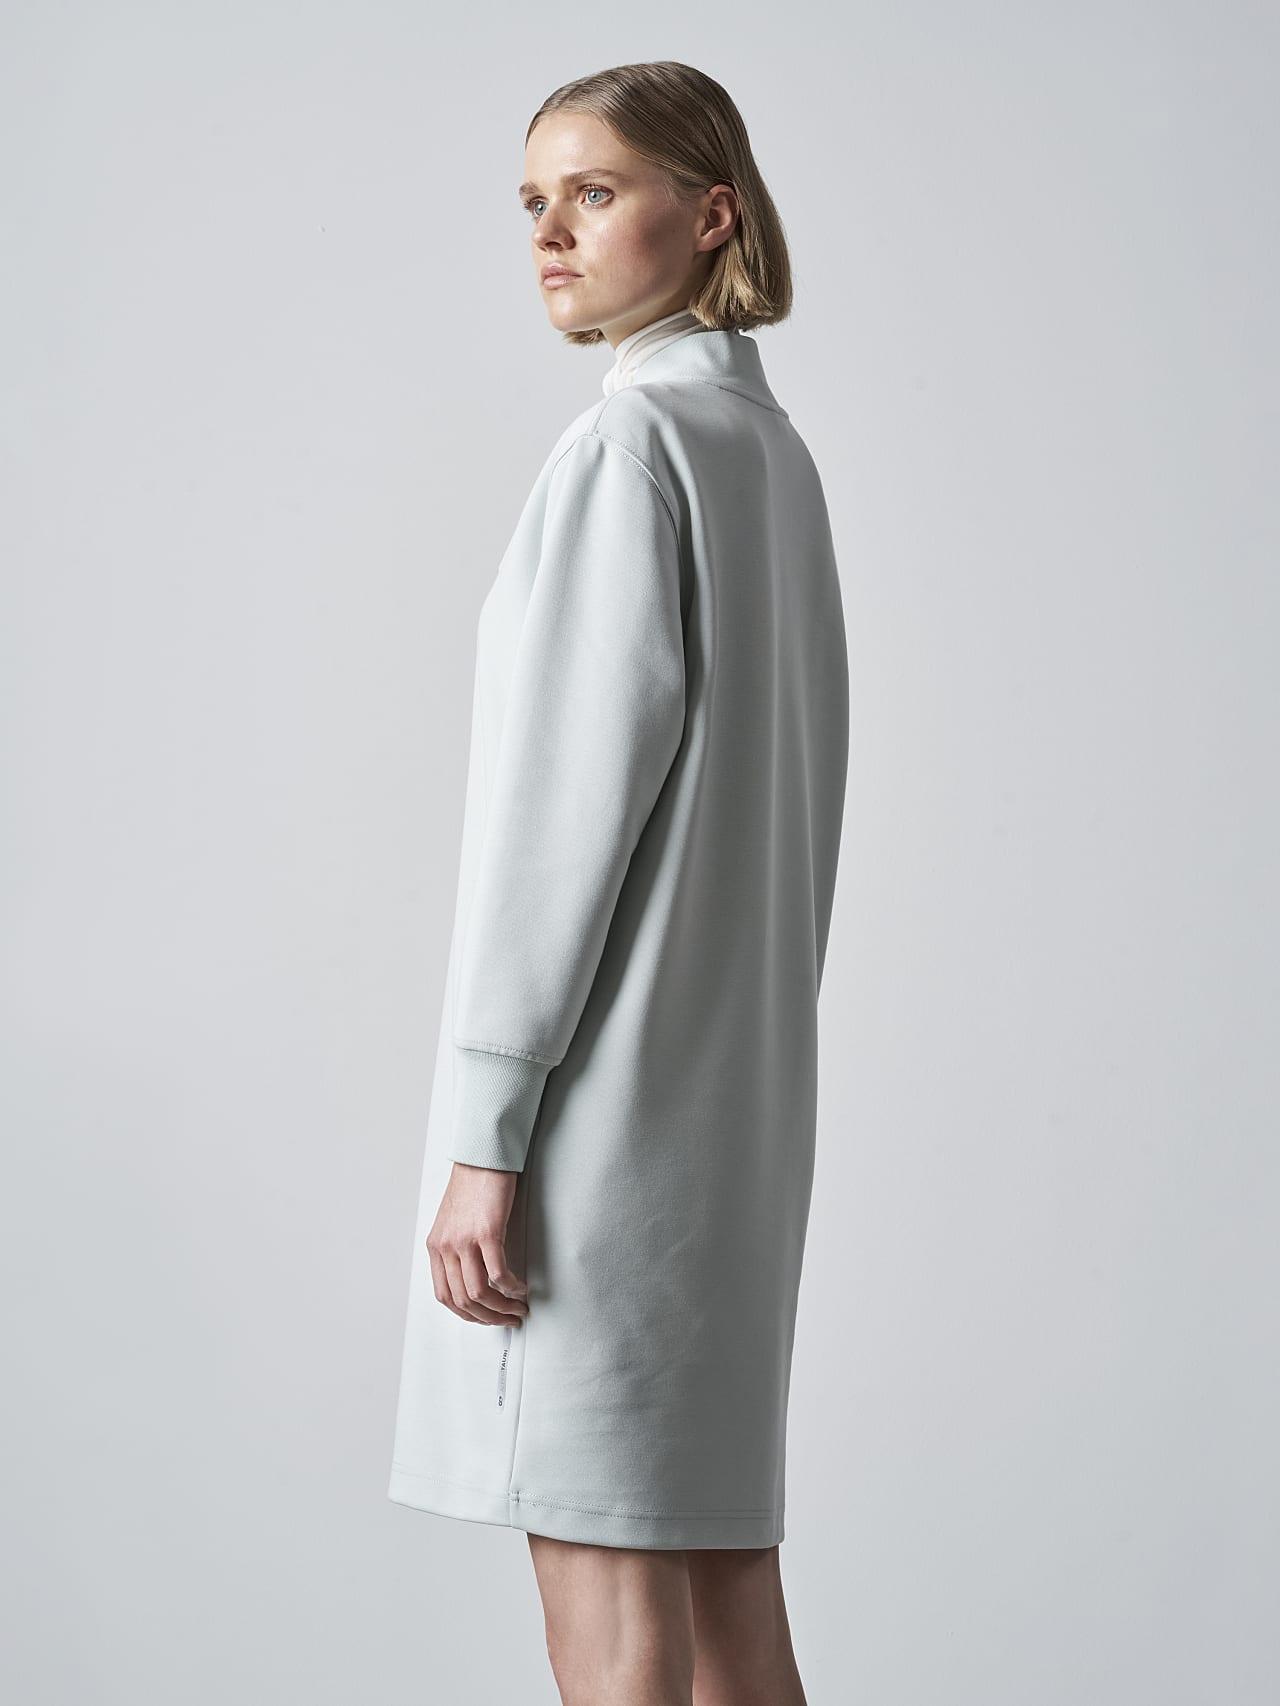 STAR V3.Y5.02 Premium Logo Sweater Dress Pale Blue  Front Main Alpha Tauri